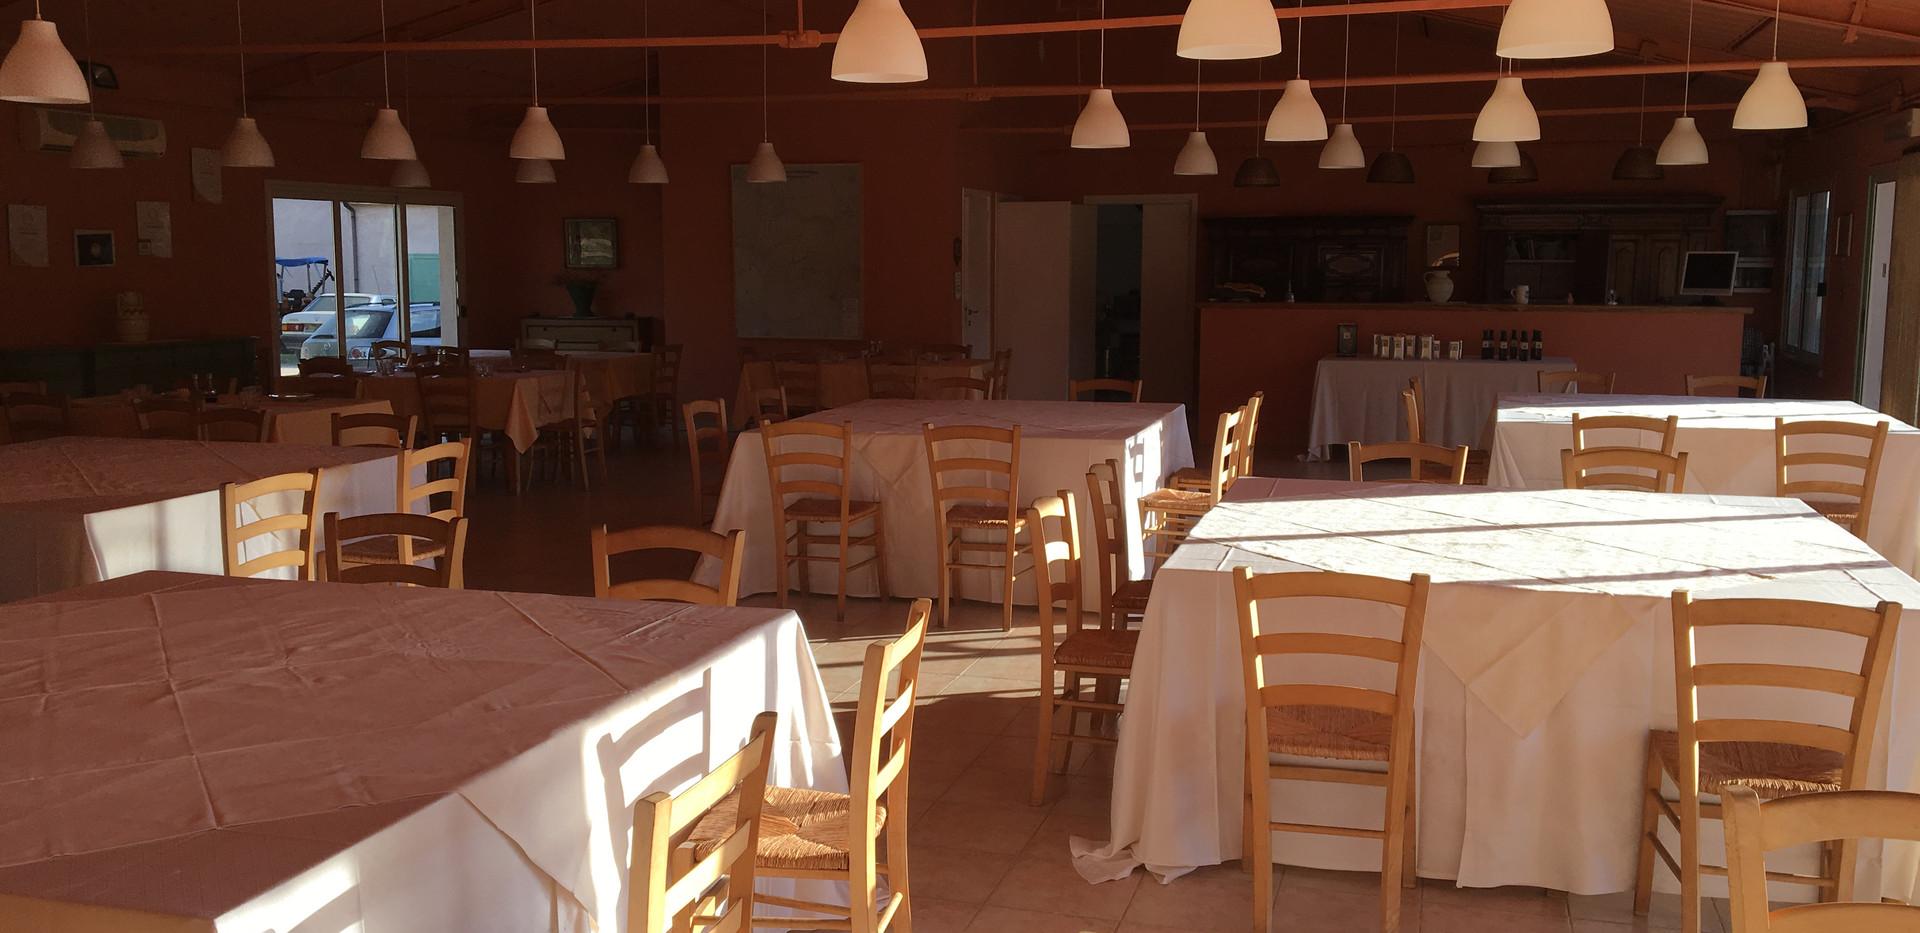 Gennaecorte ristorante.JPG